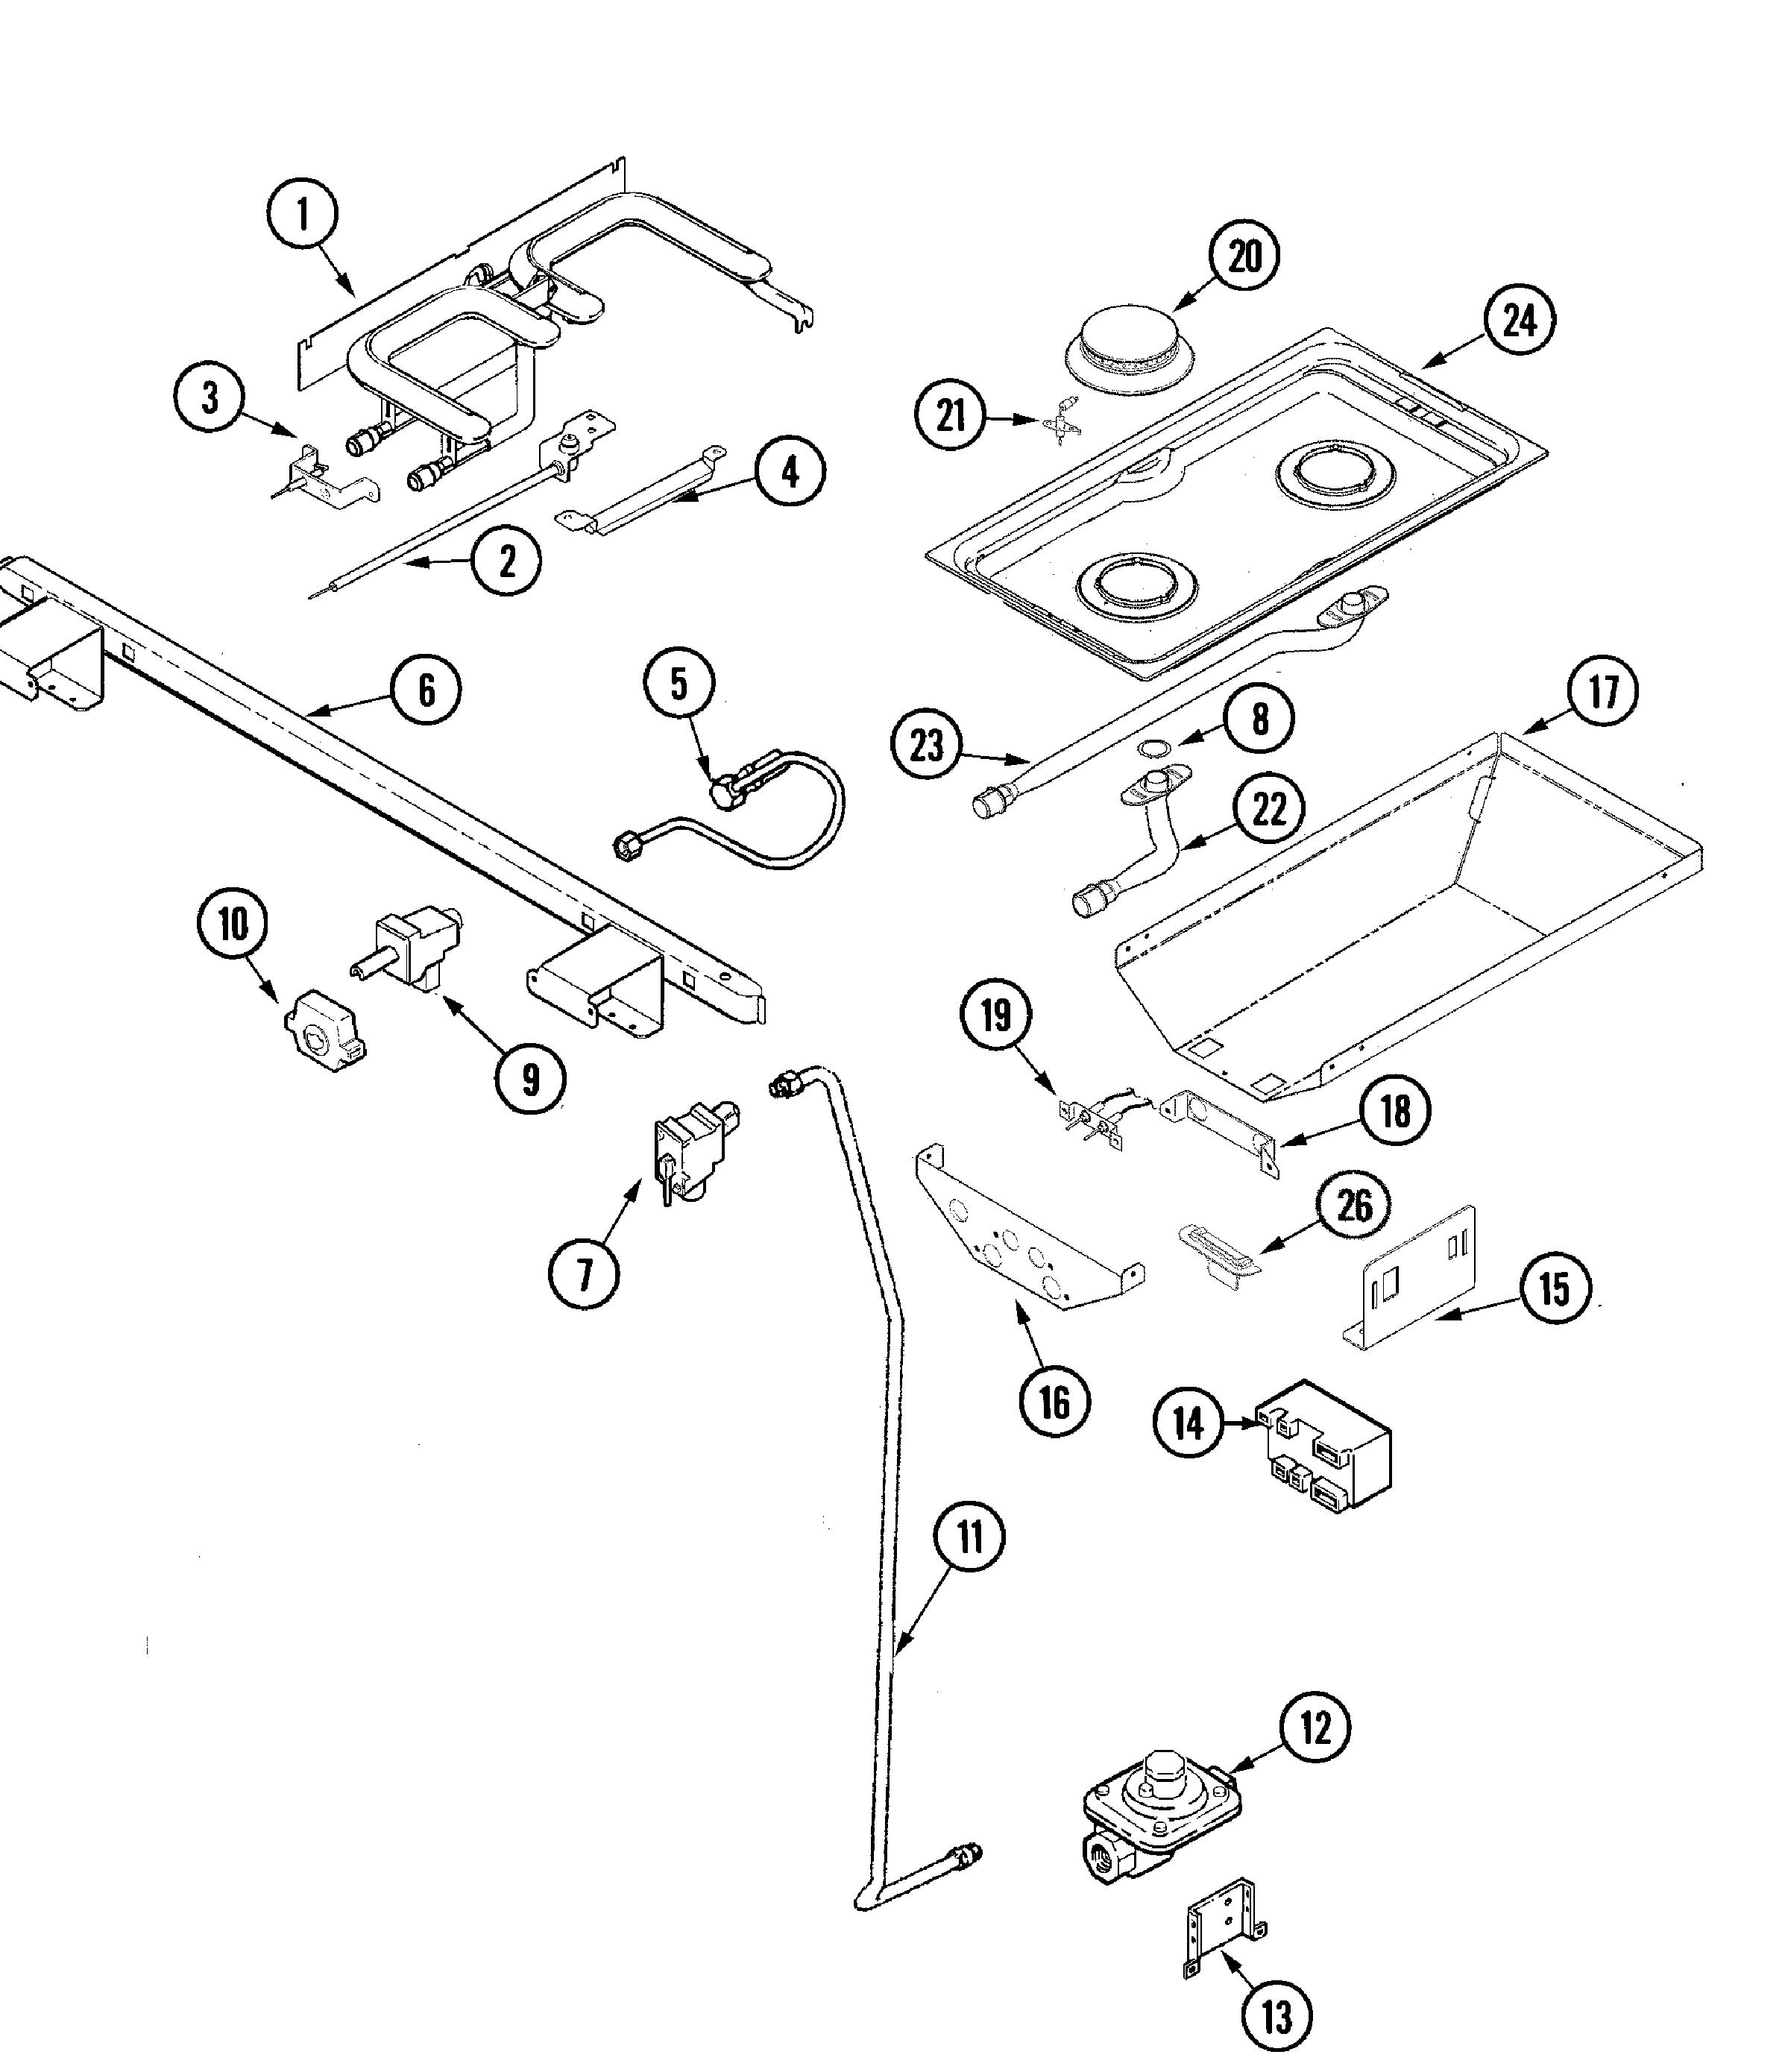 Jenn Air Cooktop Wiring Diagram further 00001 furthermore 00002 moreover 00001 further 00002. on jenn air range parts diagram